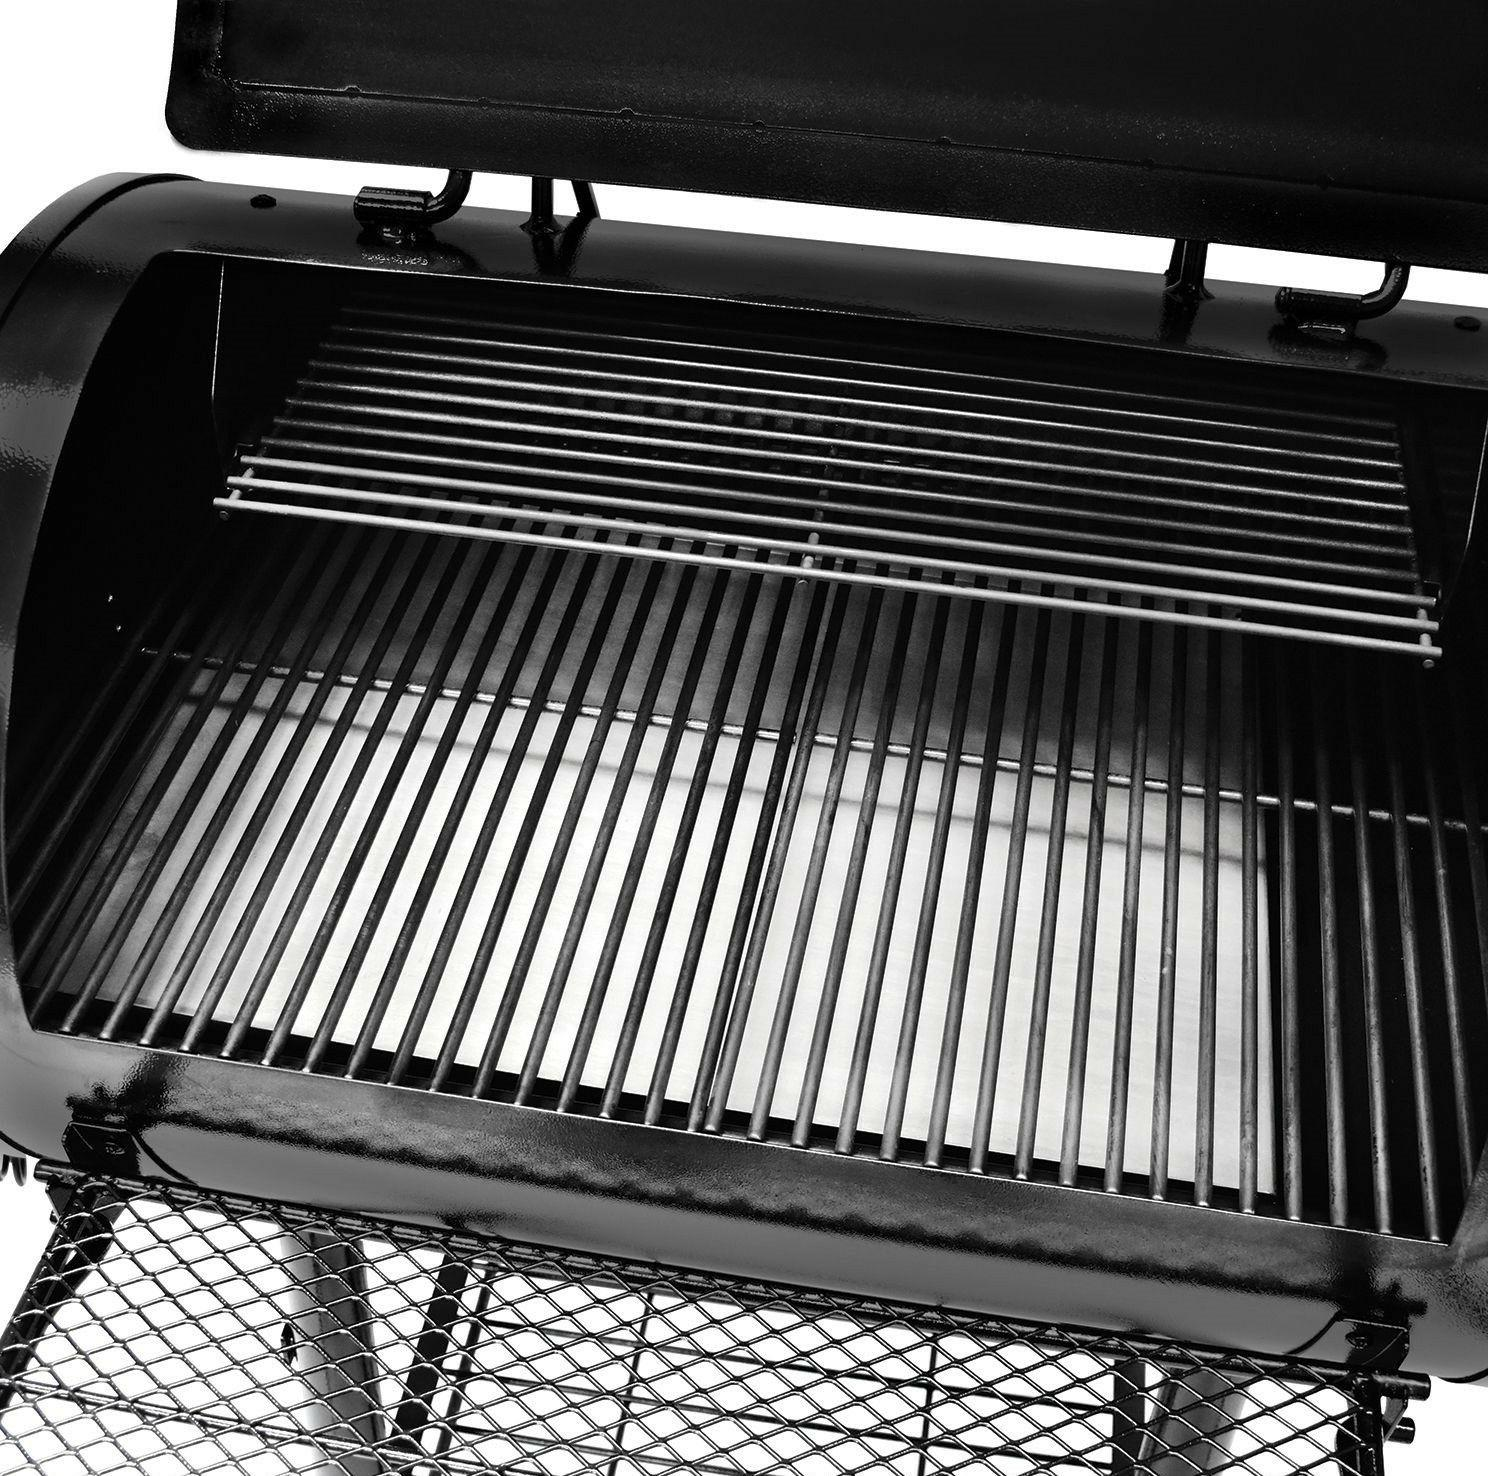 Member's Mark Smoker Grill